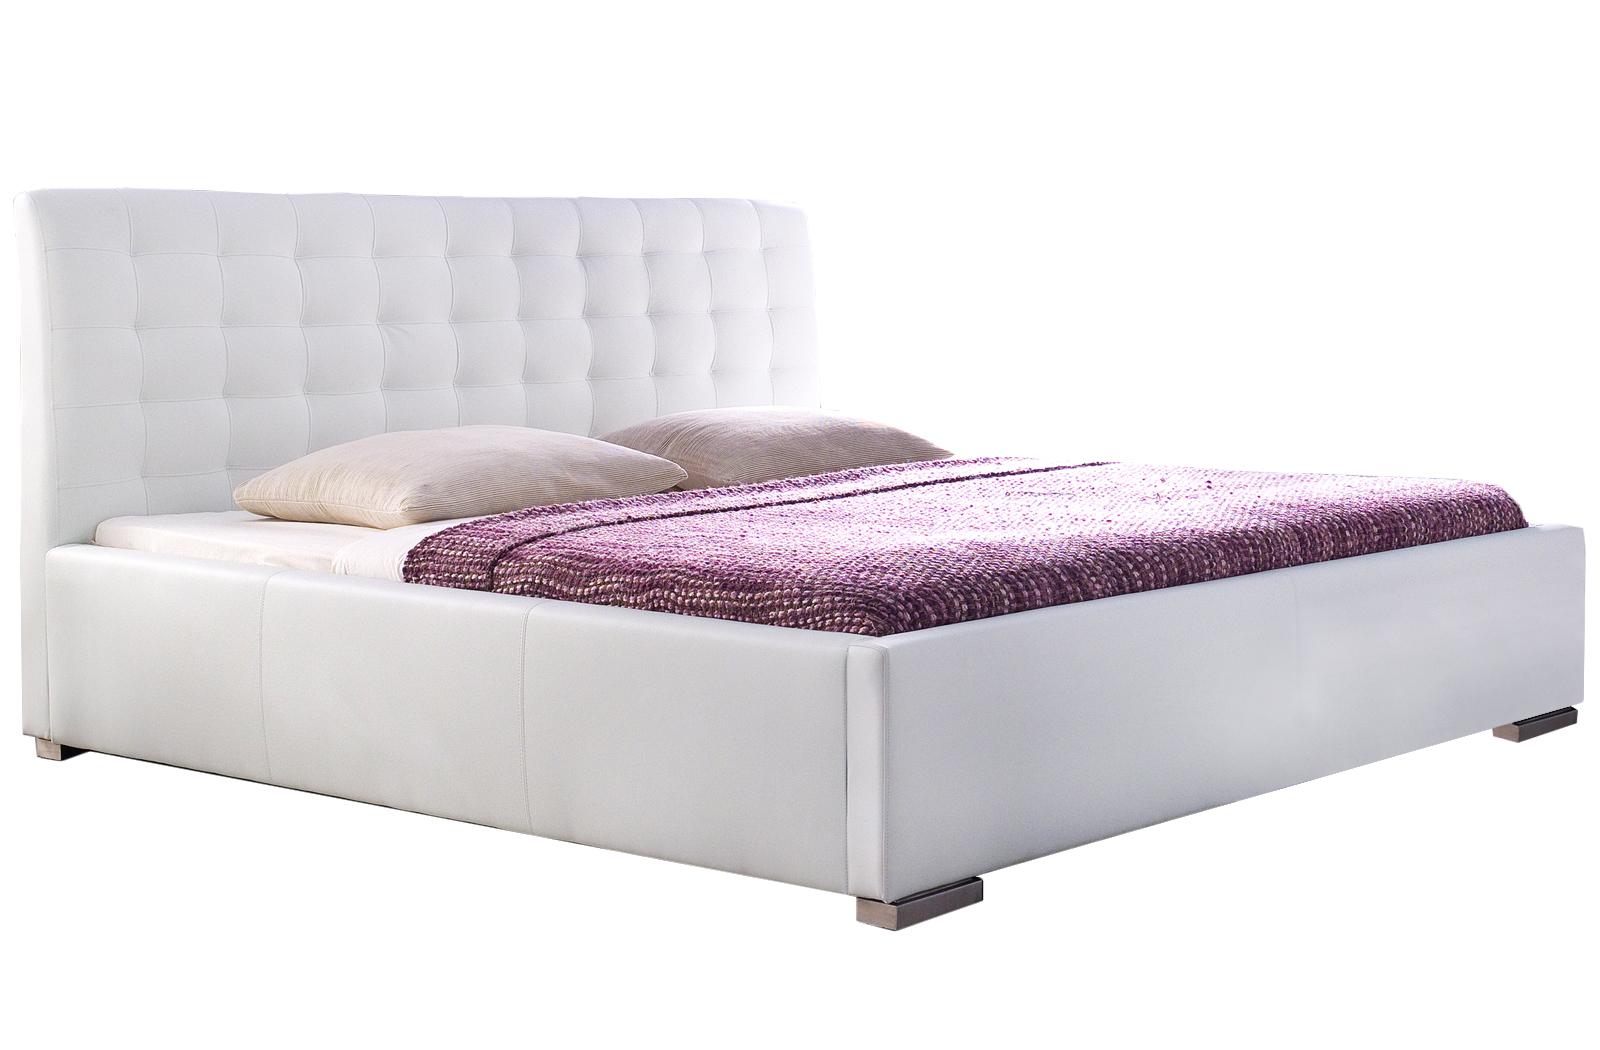 Polsterbett Kunst-Lederbett Weiß Bett Ilka Komfort – Bild 1